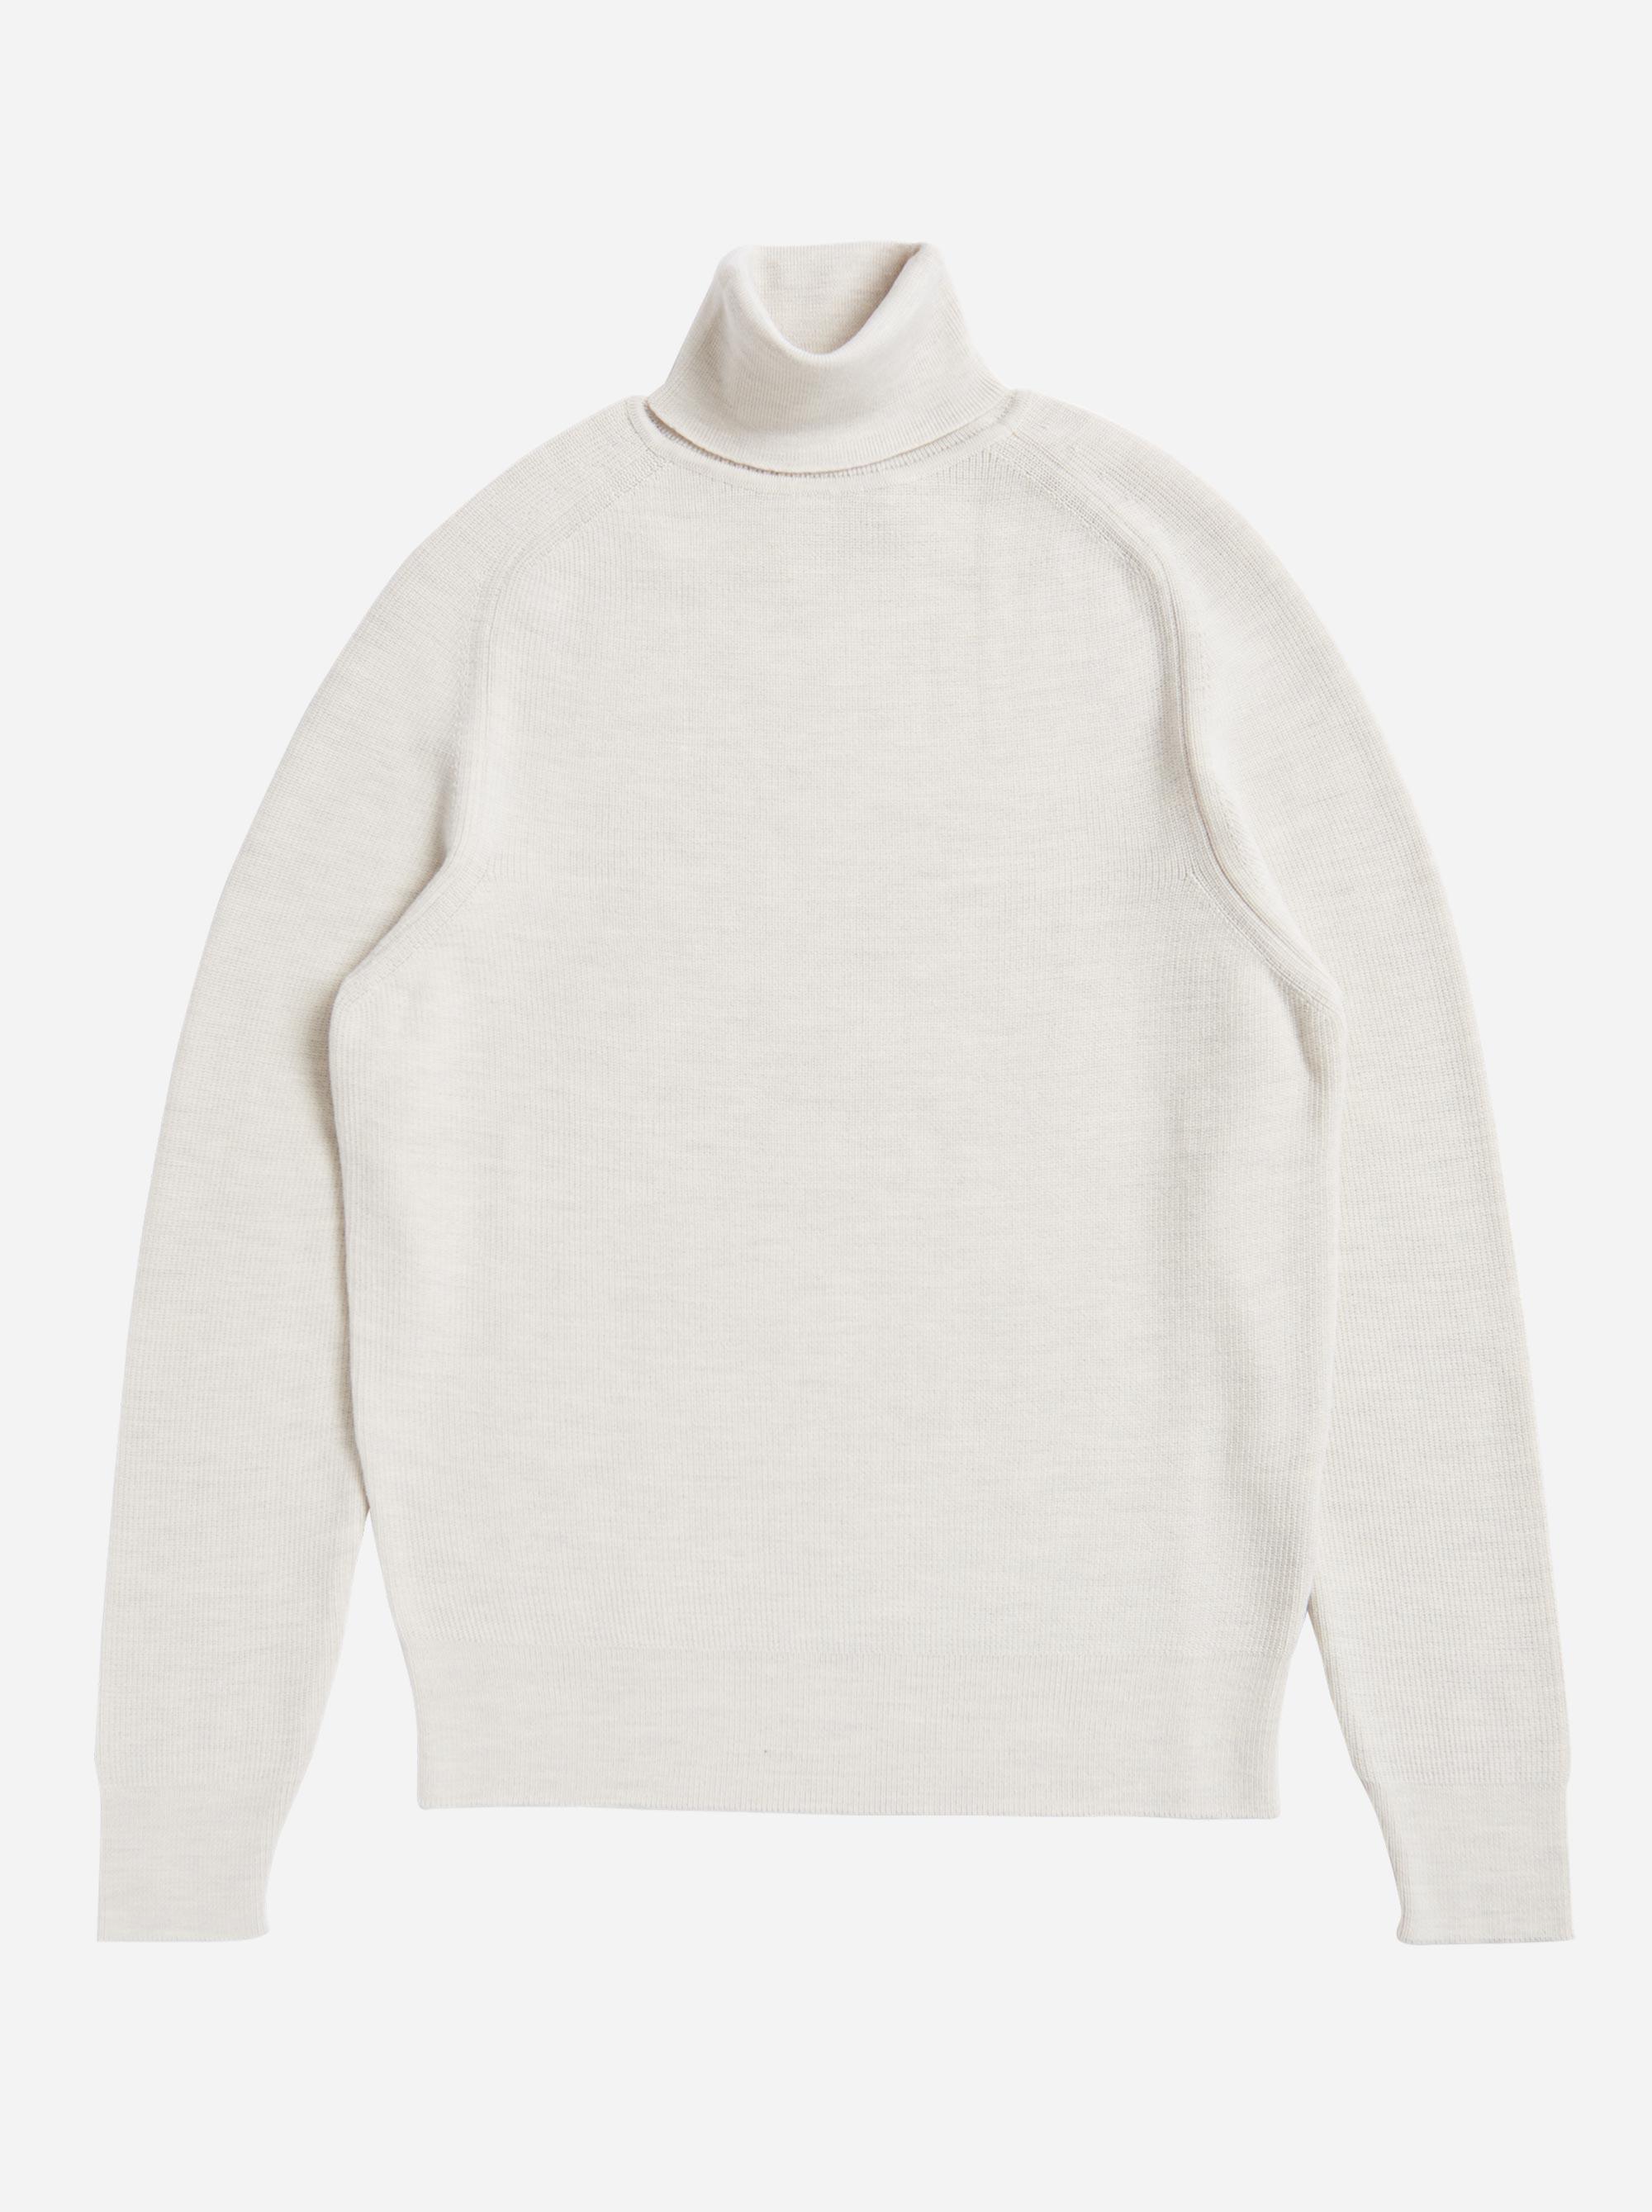 Teym - Turtleneck - The Merino Sweater - Women - White - 7